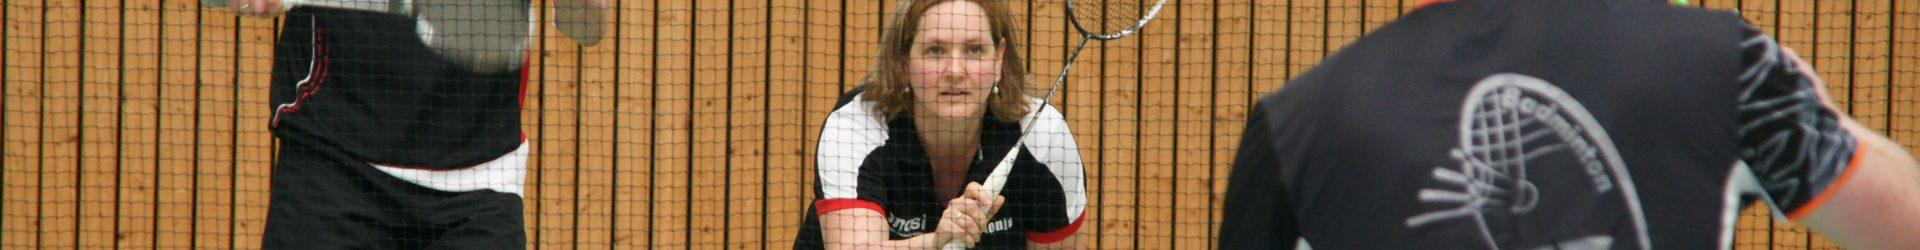 Badmintoner glücklos zum Saisonende